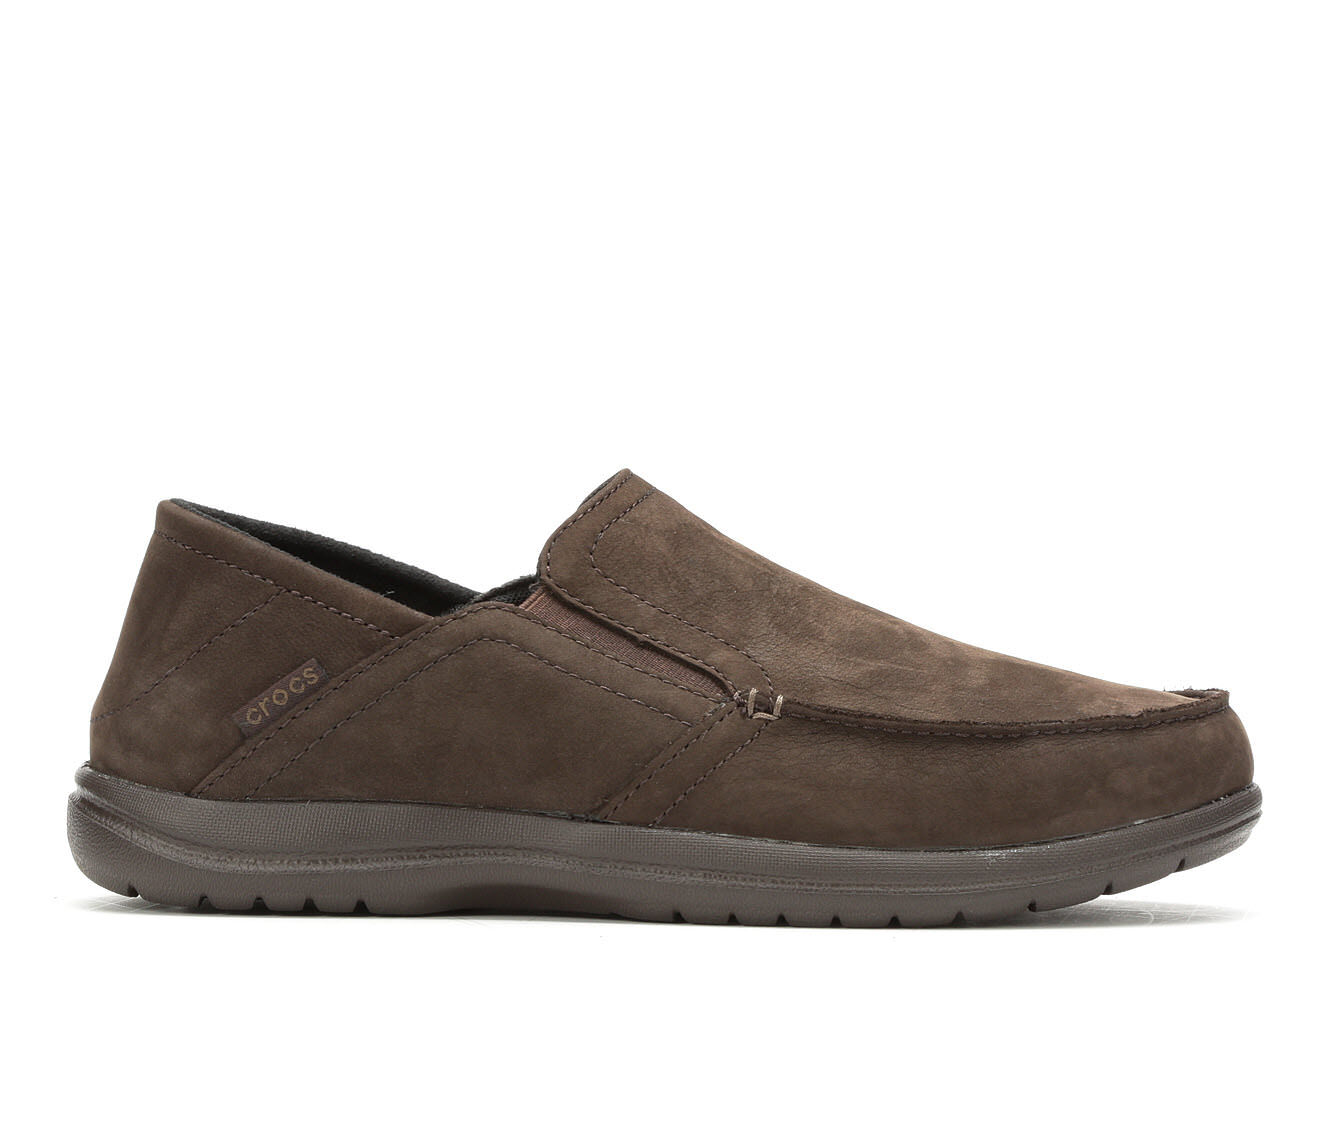 Men's Crocs Santa Cruz Convertible Leather Slip On Espresso